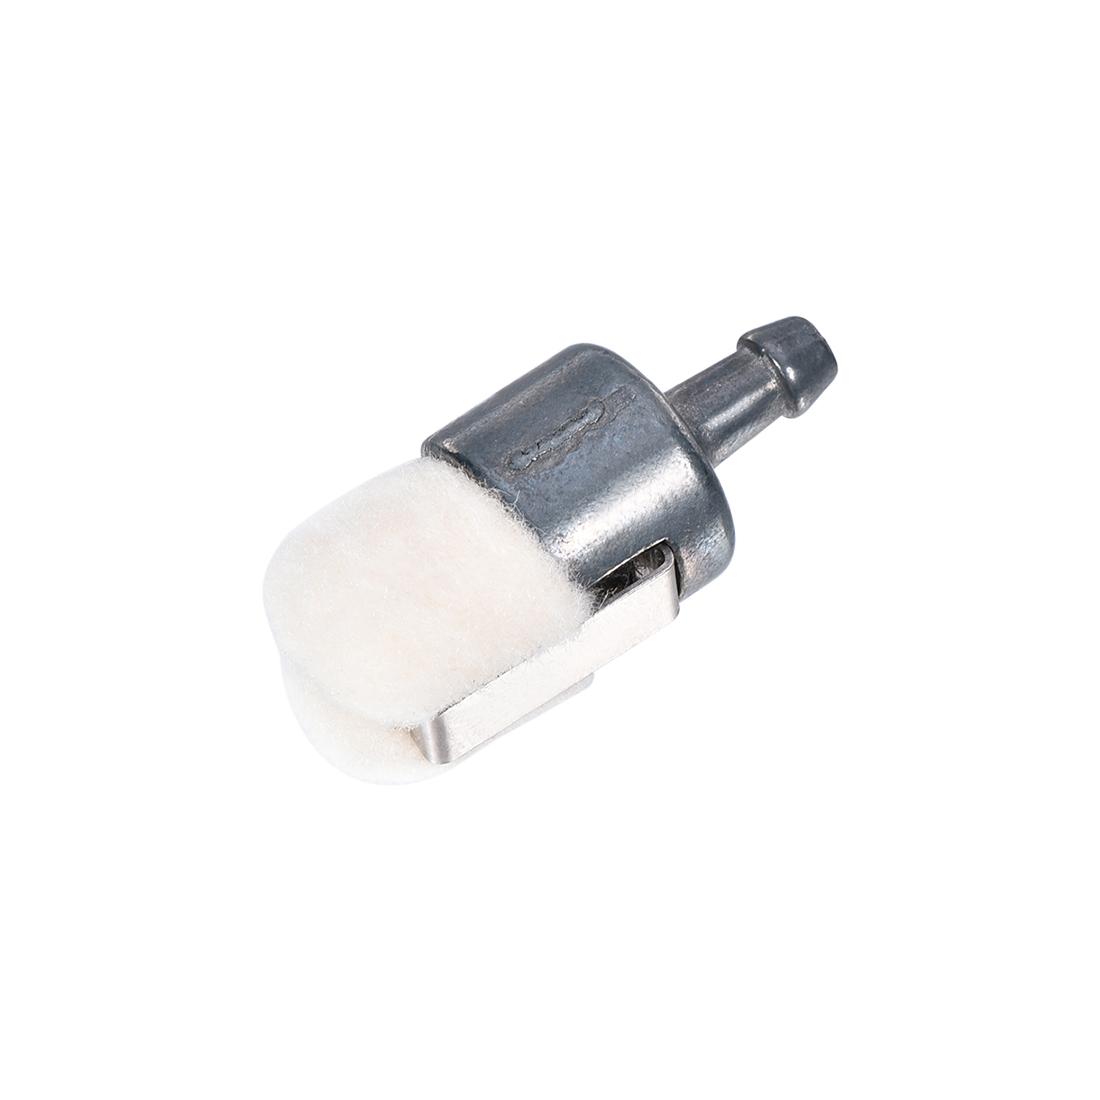 125-527 Fuel Filter for ECHO String Trimmer Edger Backpack Blower